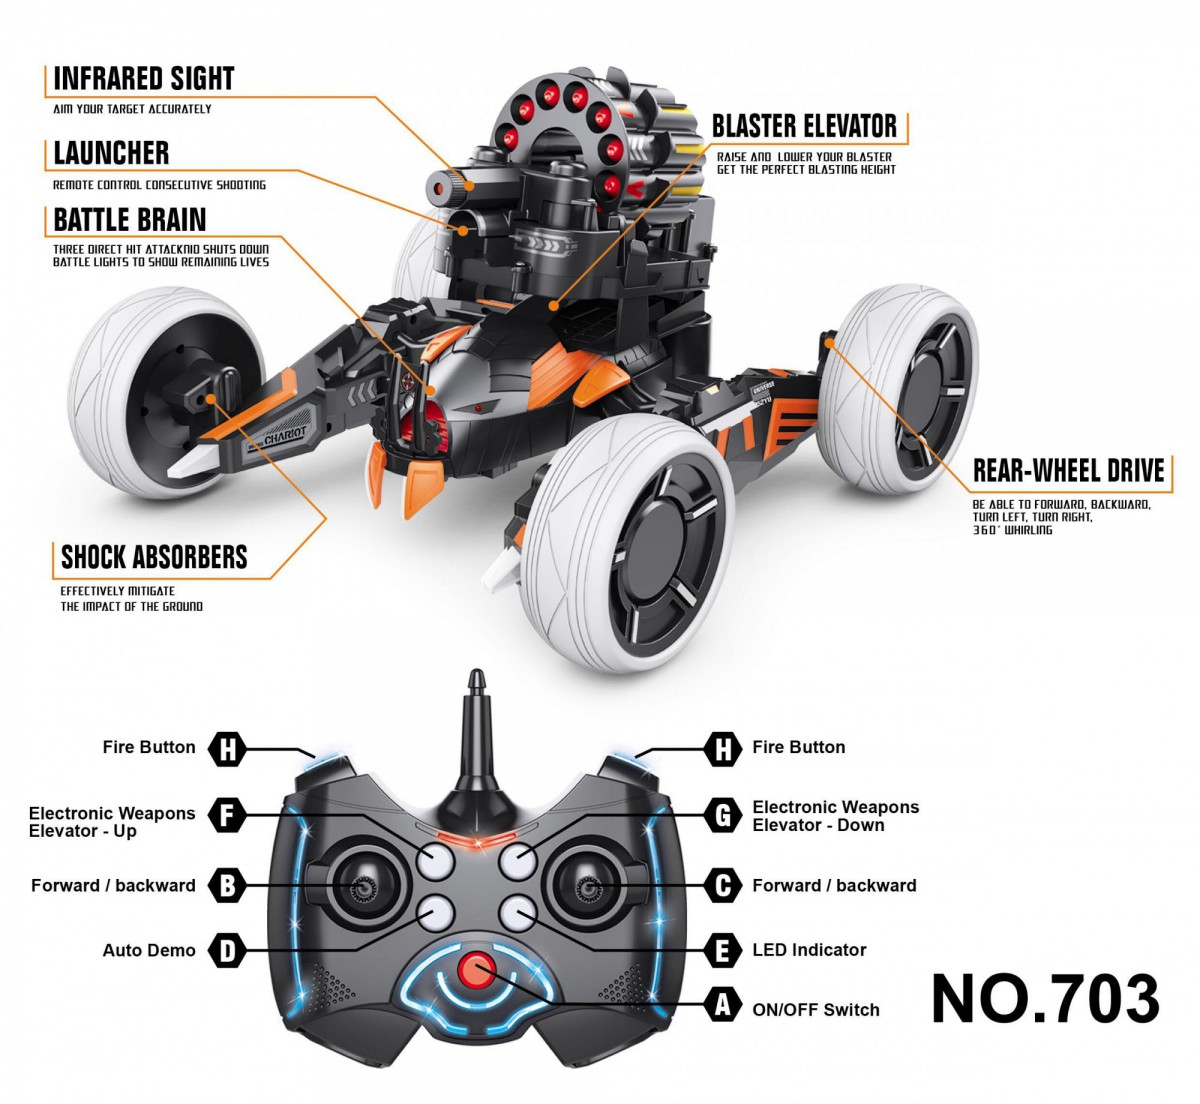 KT703 Радиоуправляемая боевая машина Keye Toys Space Warrior (лазер, стрелы) 2.4G - KT703